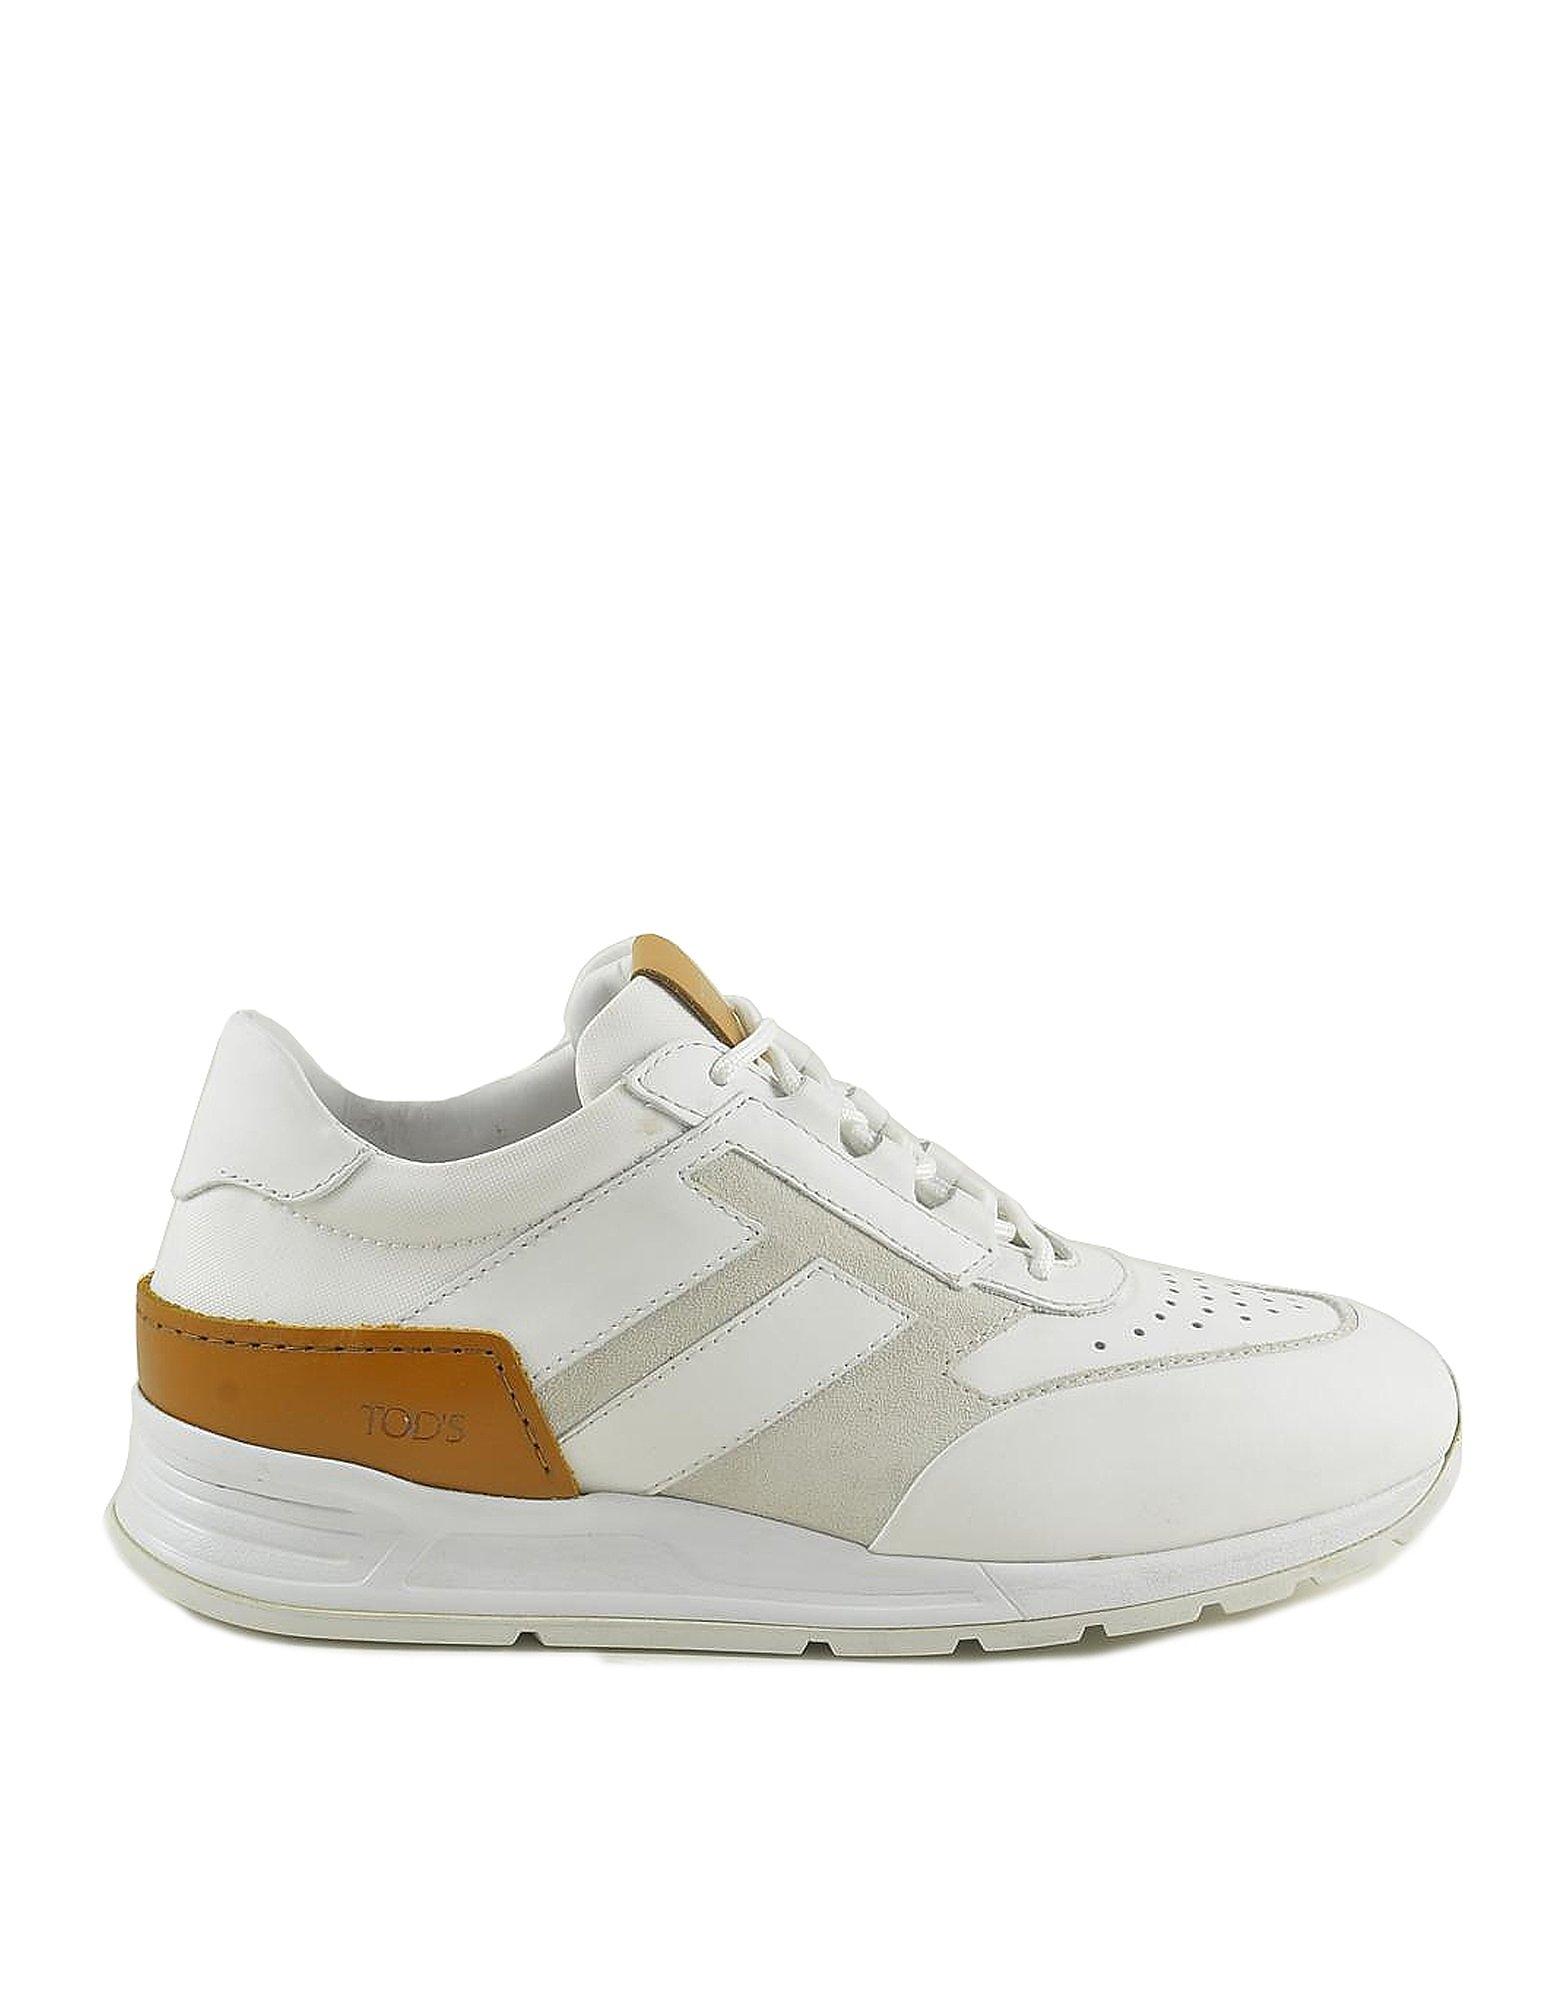 Tod's Designer Shoes, Men's White Sneakers